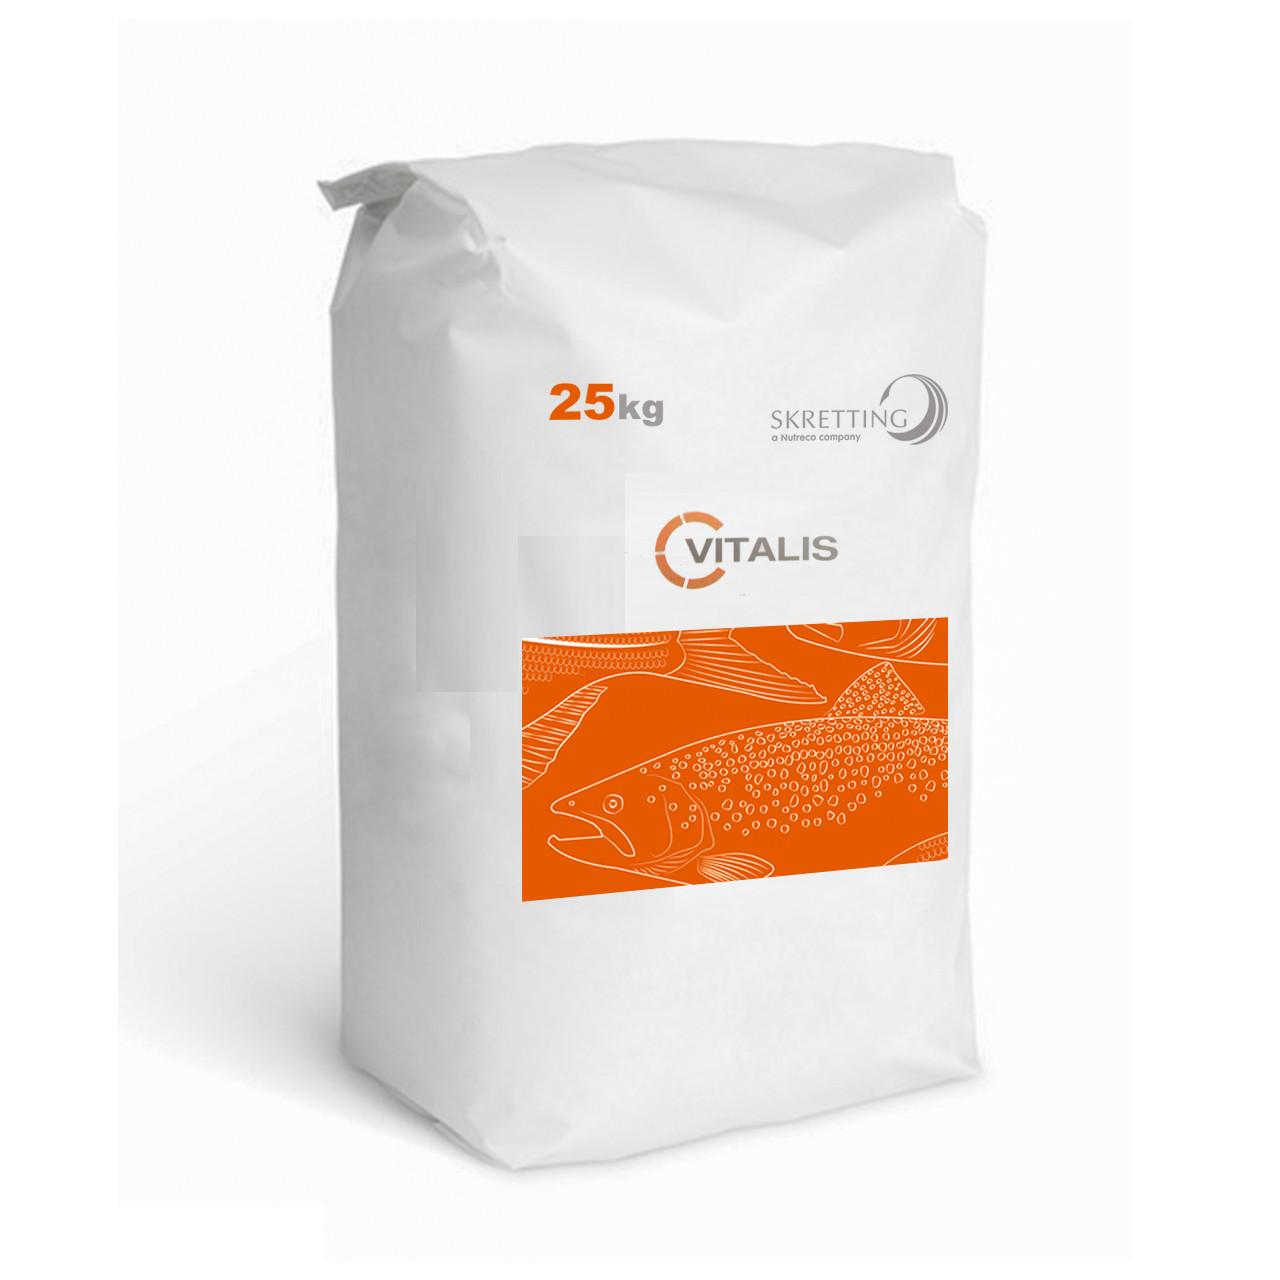 Alimento Skretting para Reproductores Marinos Vitalis CAL de 22 mm